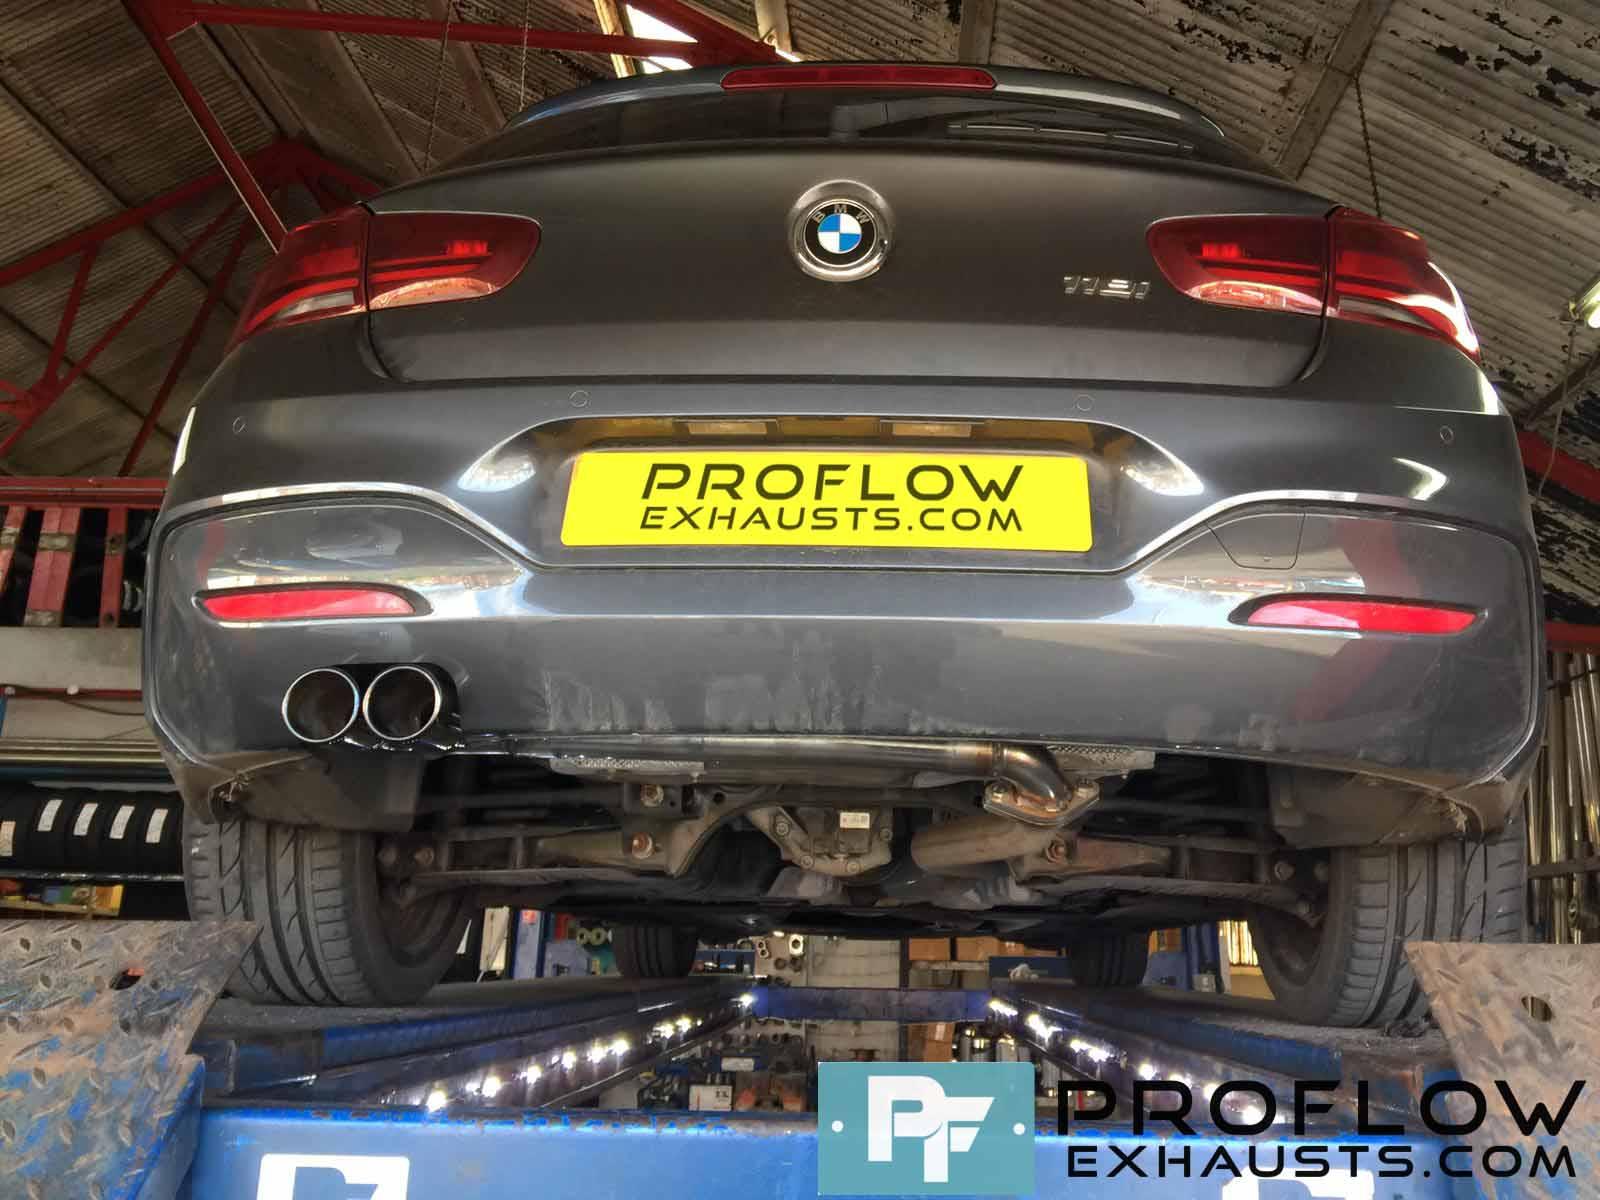 Proflow Exhausts Custom Stainless Steel Bmw Back Box 105 Black(1) £150